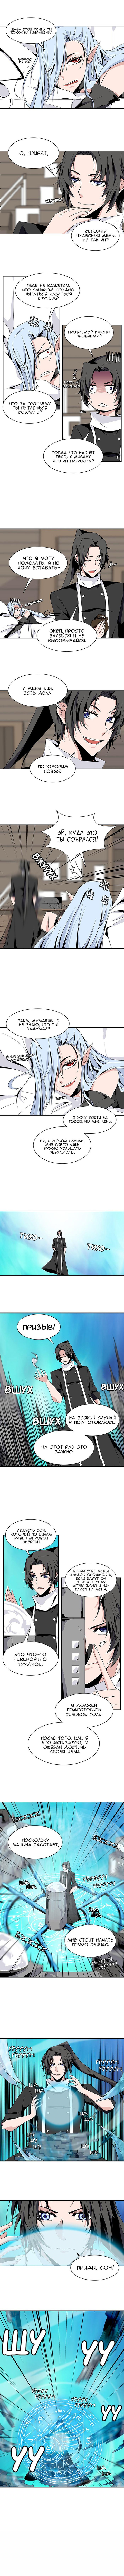 https://r1.ninemanga.com/comics/pic3/48/28784/1277179/1542357138420.jpg Page 3